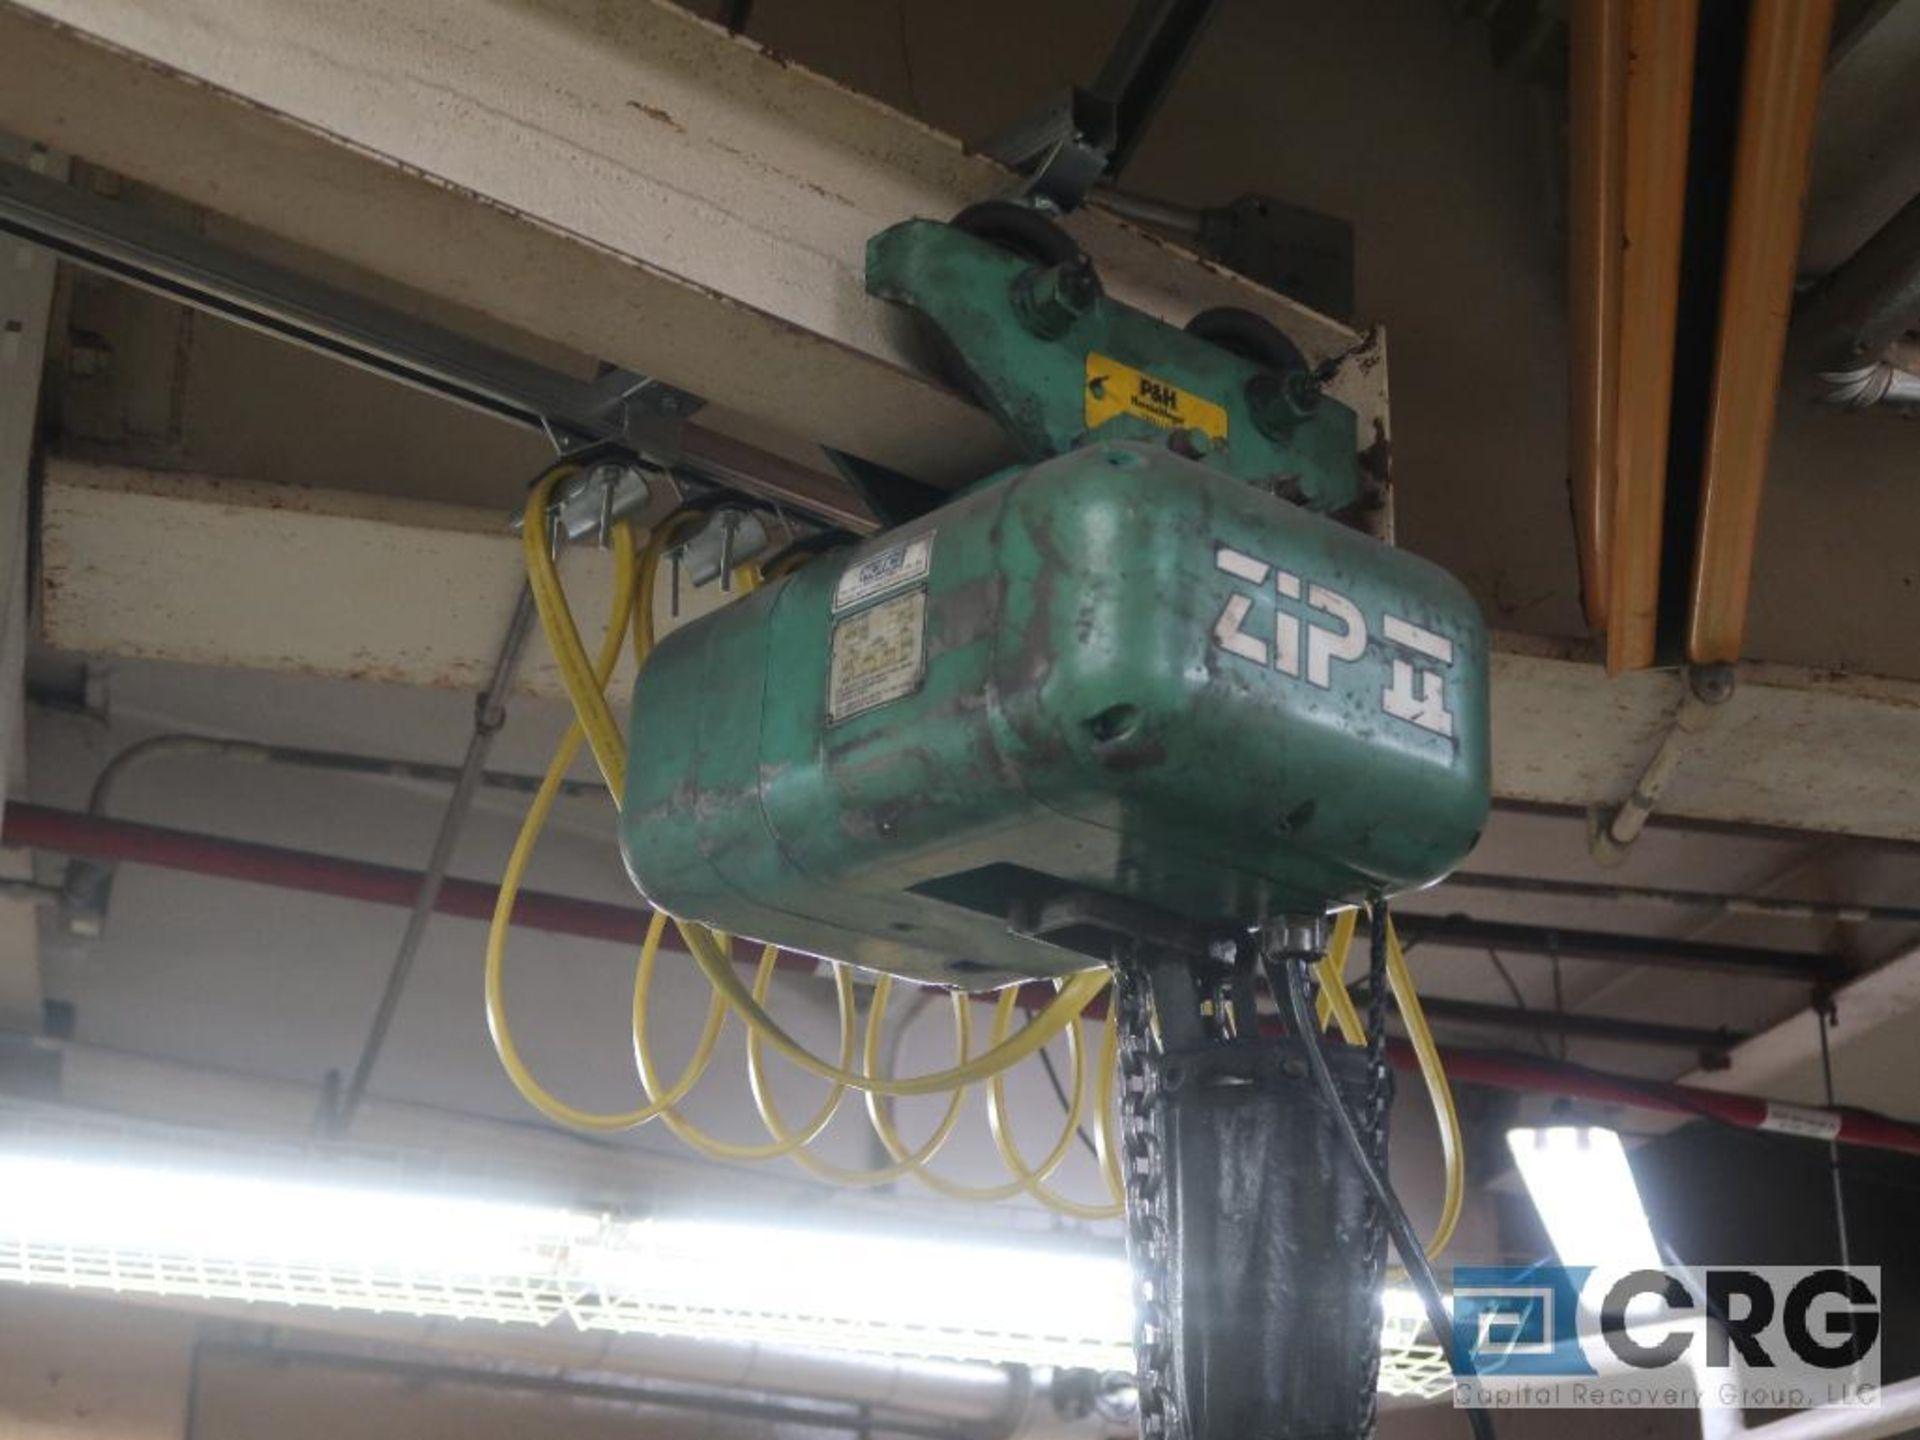 Lot of (2) chain hoists, (1) electric, 1 ton cap., and (1) manual, 1 ton cap.-no rail, hoist only (